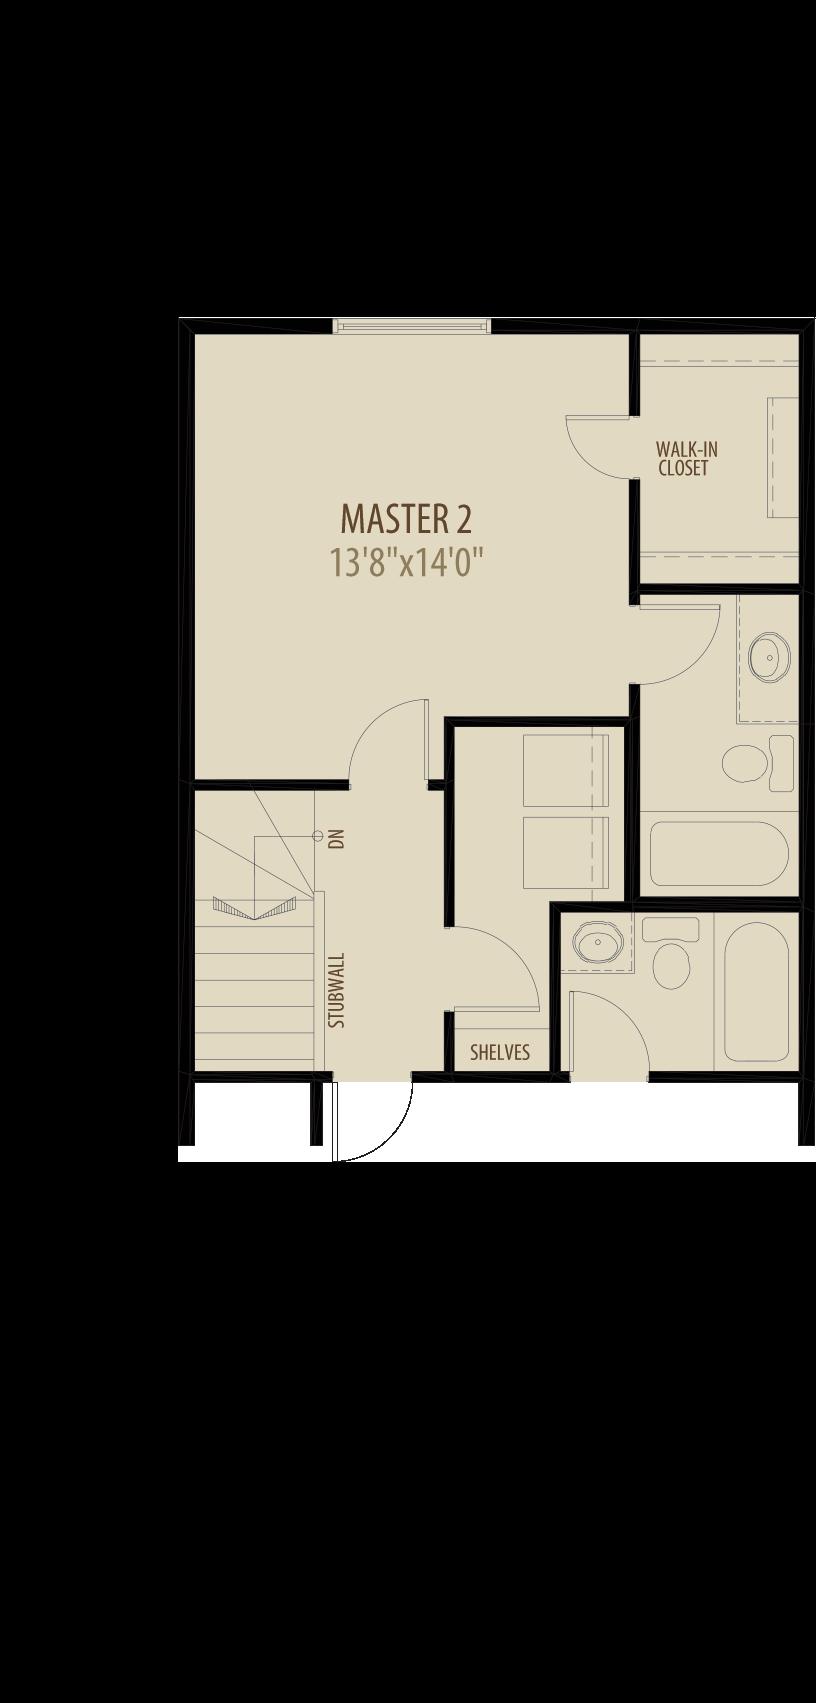 Dual Master Suites w/ Laundry